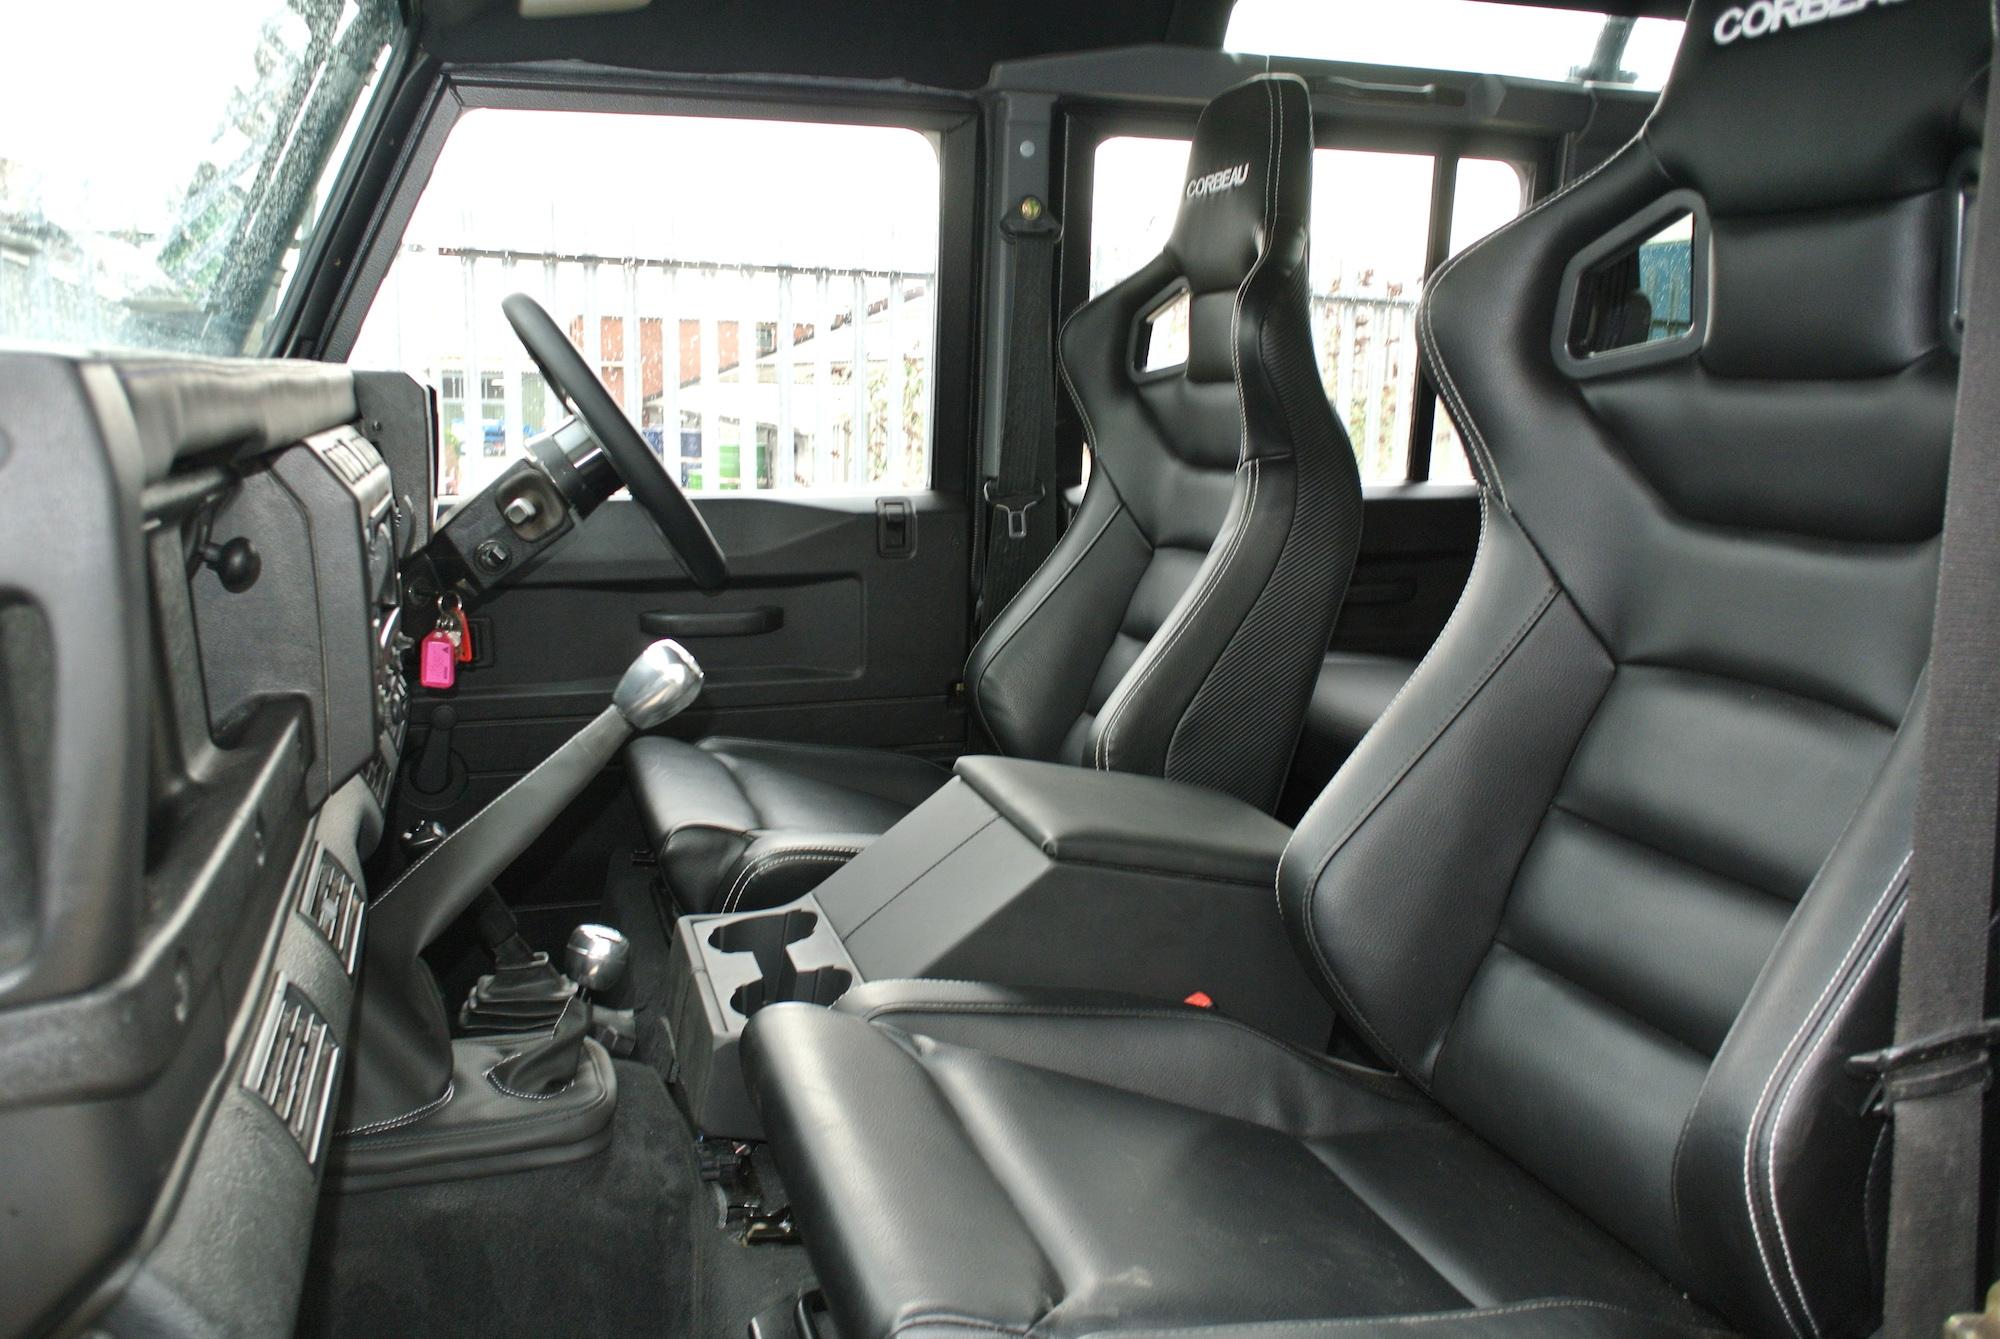 CORBEAU VINYL SEATS PAIR - HEATED £1680. STANDARD